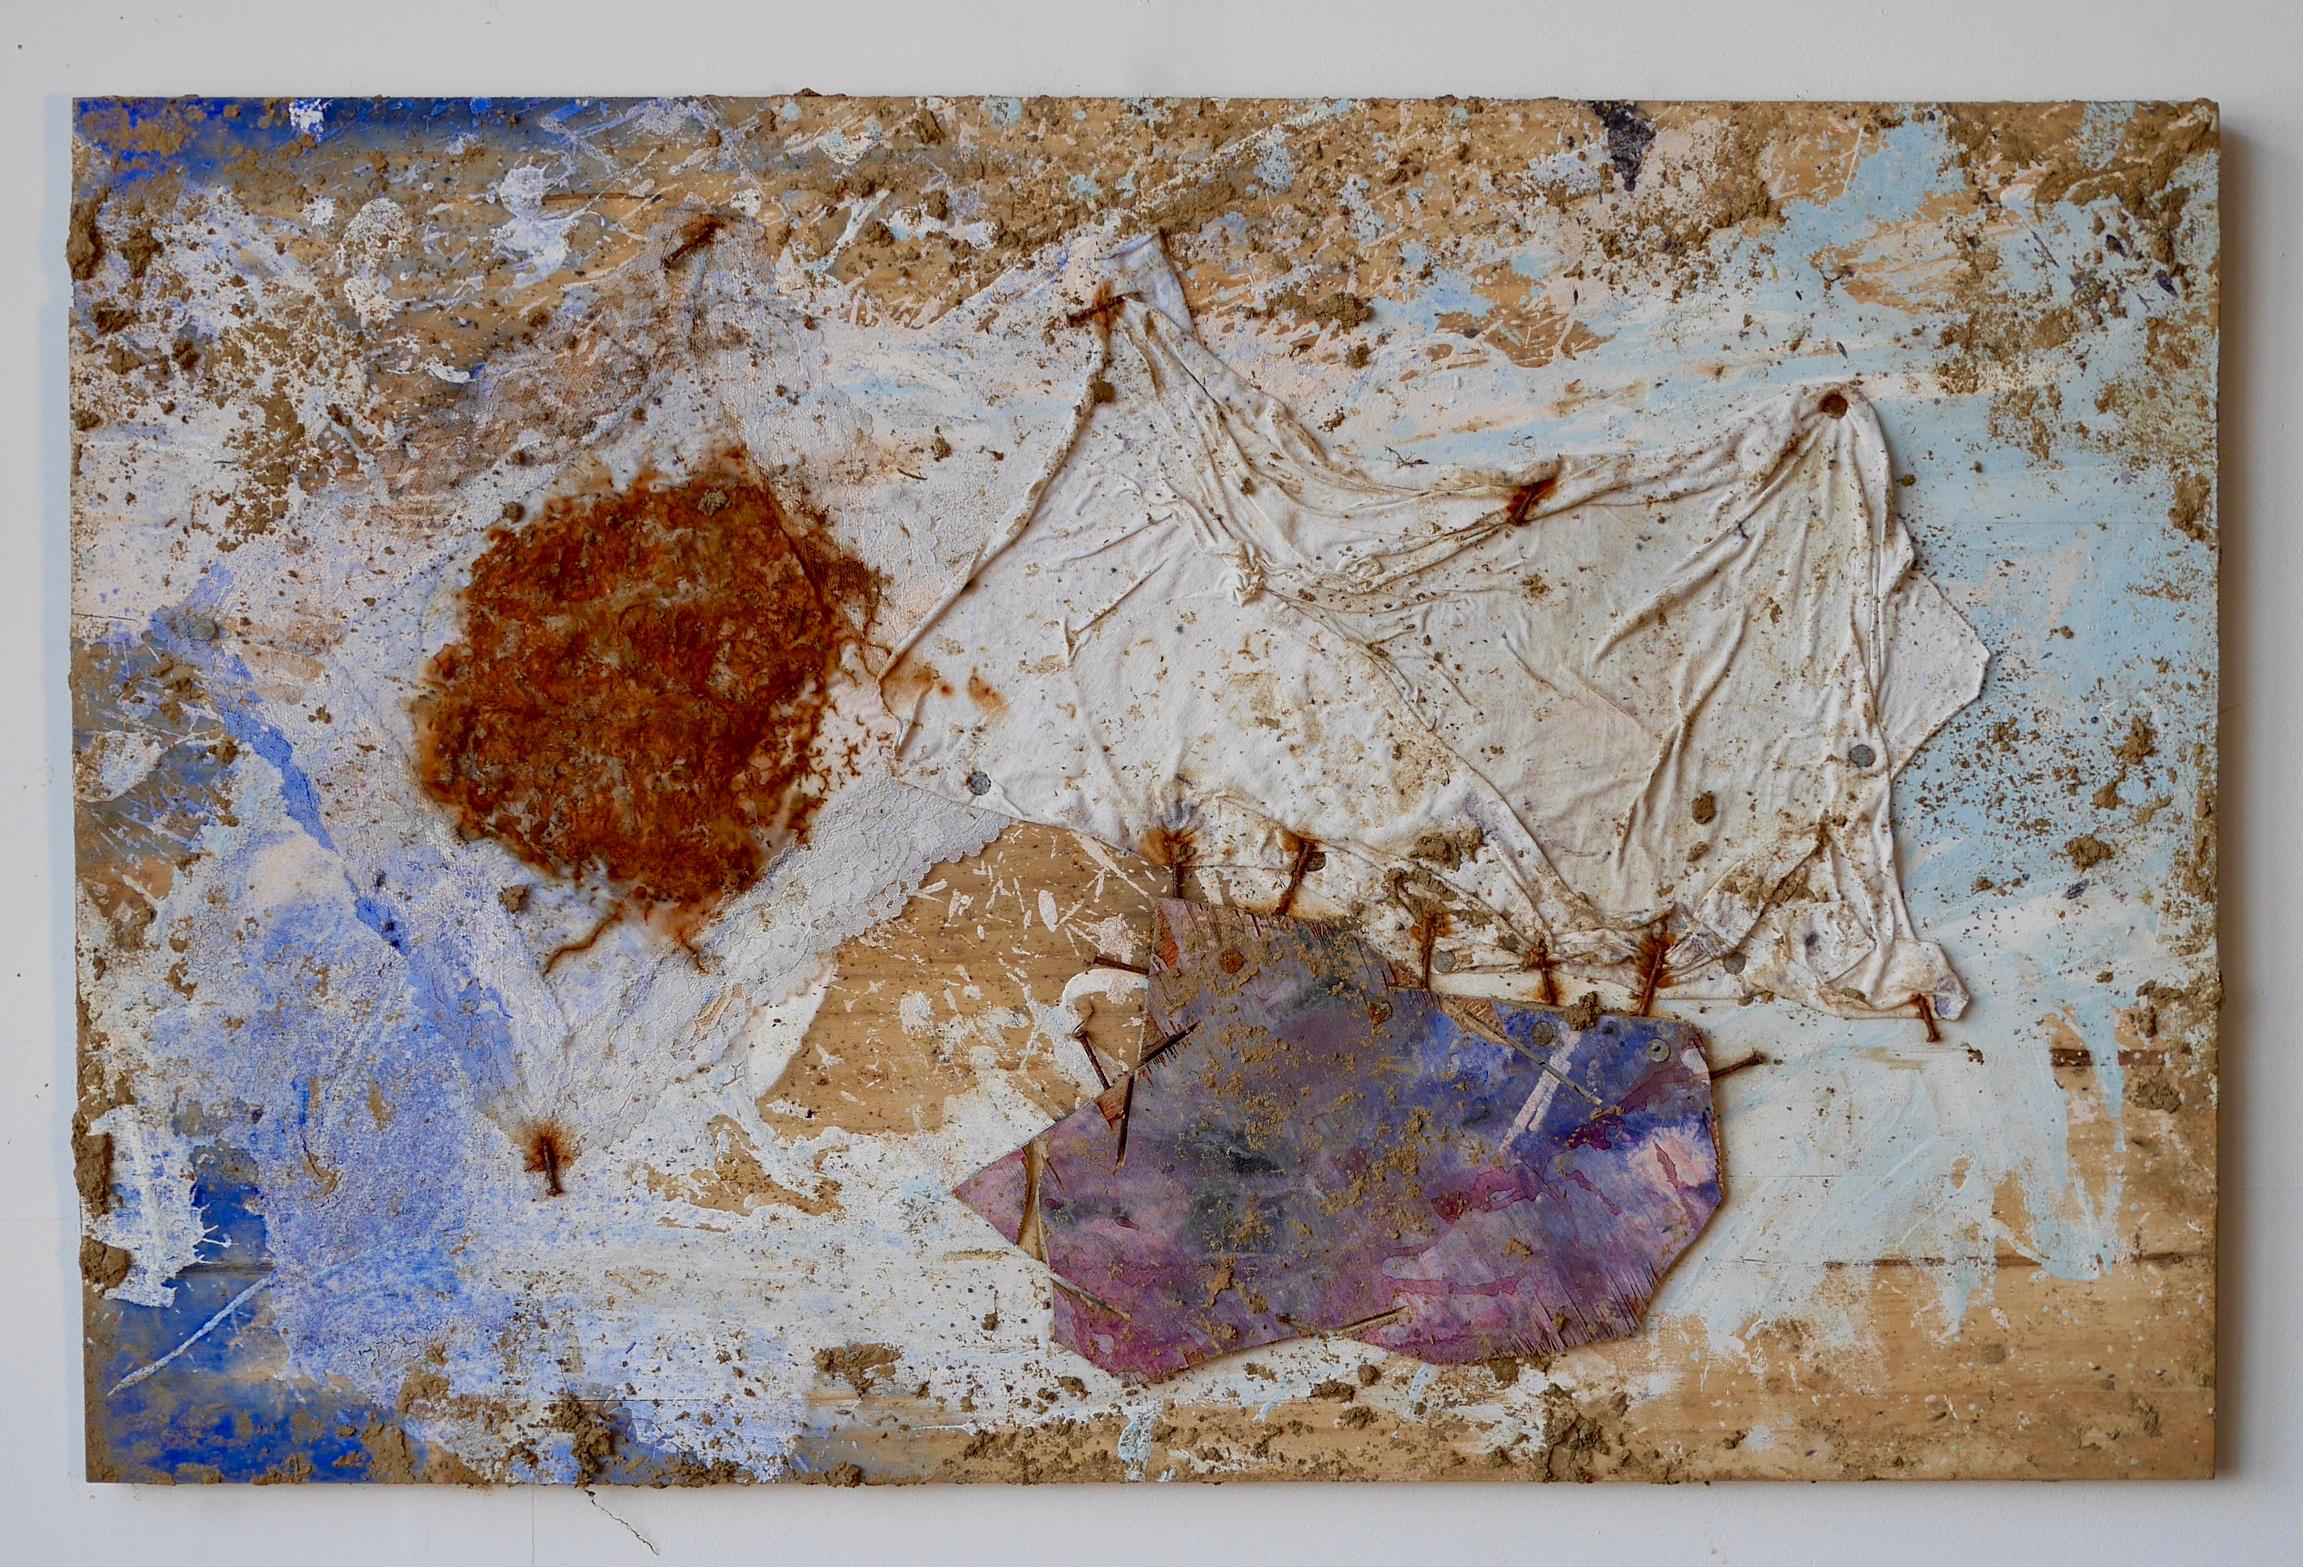 "Number 8 - Hidden, Sleeping  24"" x 32""  Lace handkerchief, steel wool, white t-shirt fabric piece, nails, wood, acrylic, milk, vinegar, salt, ink, dye, white flour, steel wire, staples, rust, dirt, mold on wood  (2015)"